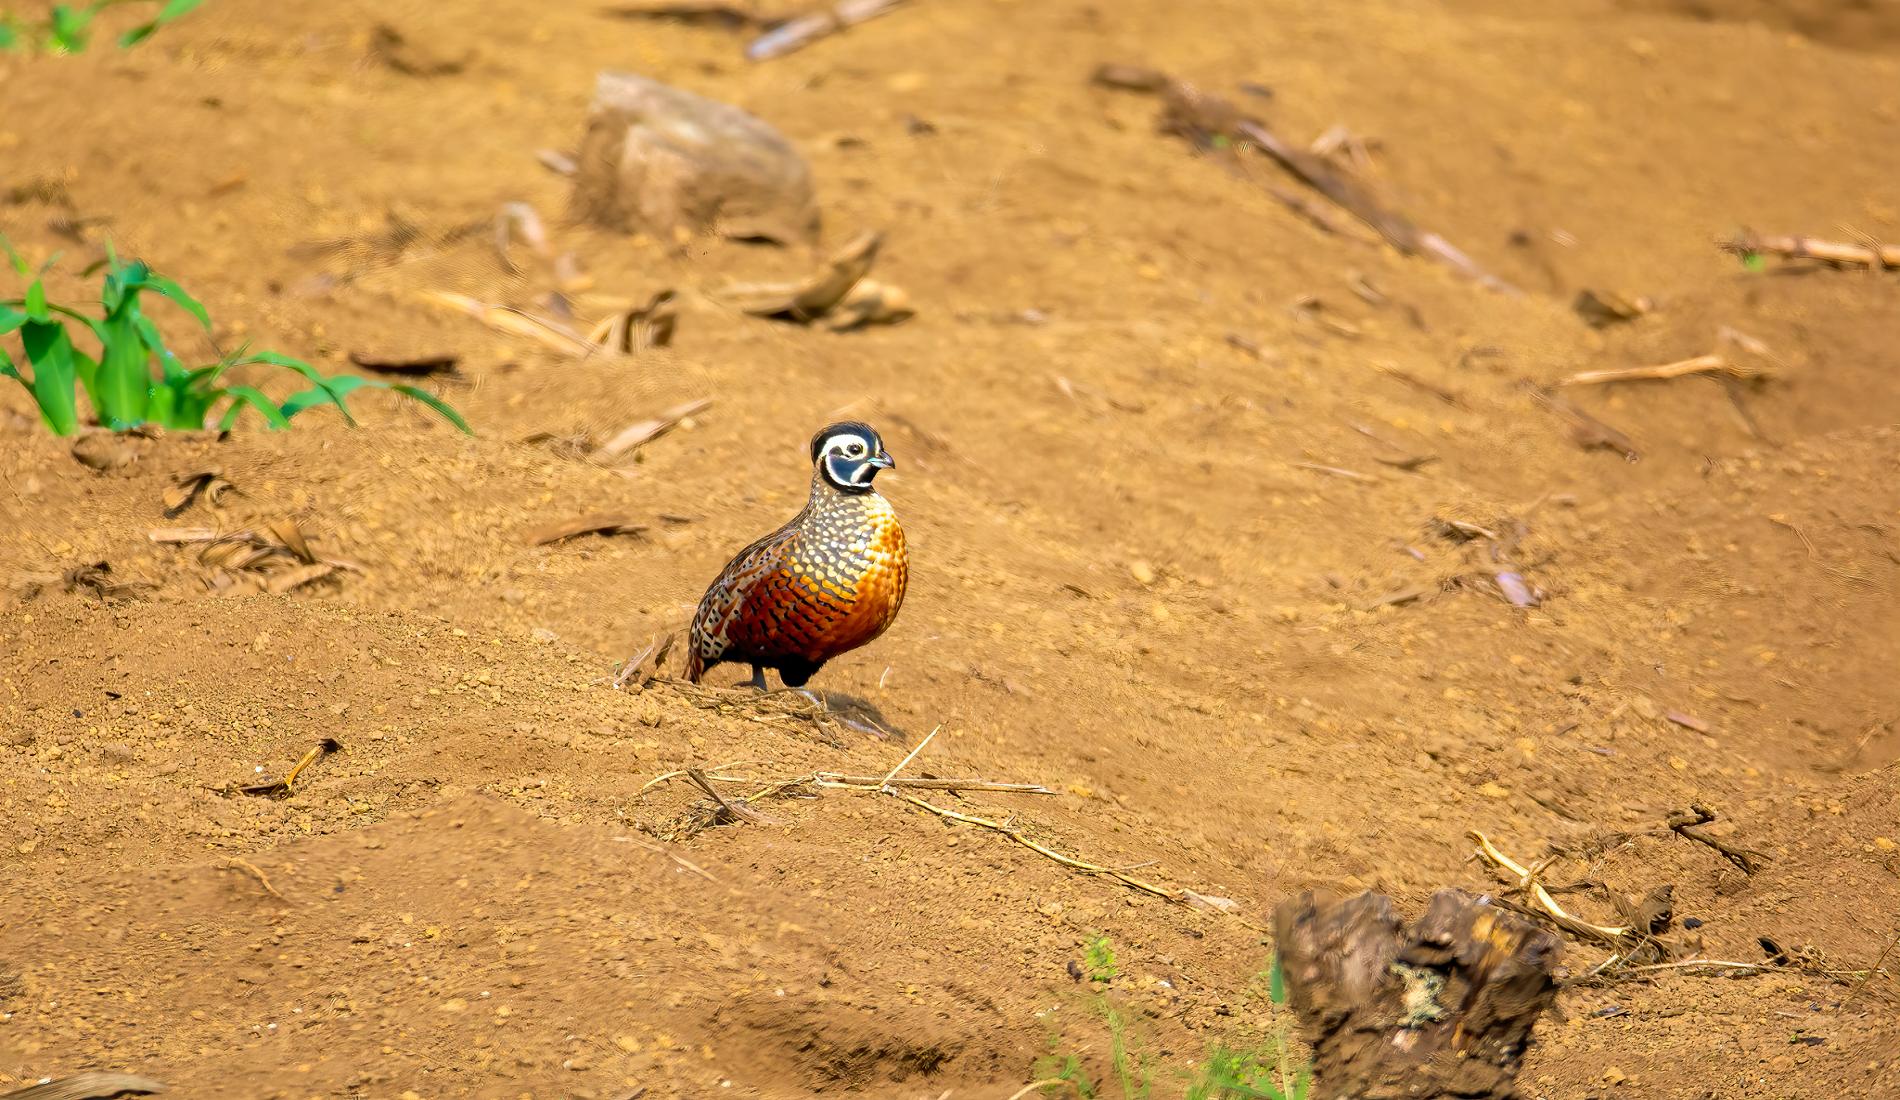 Ocellated Quail vogelreis guatemala